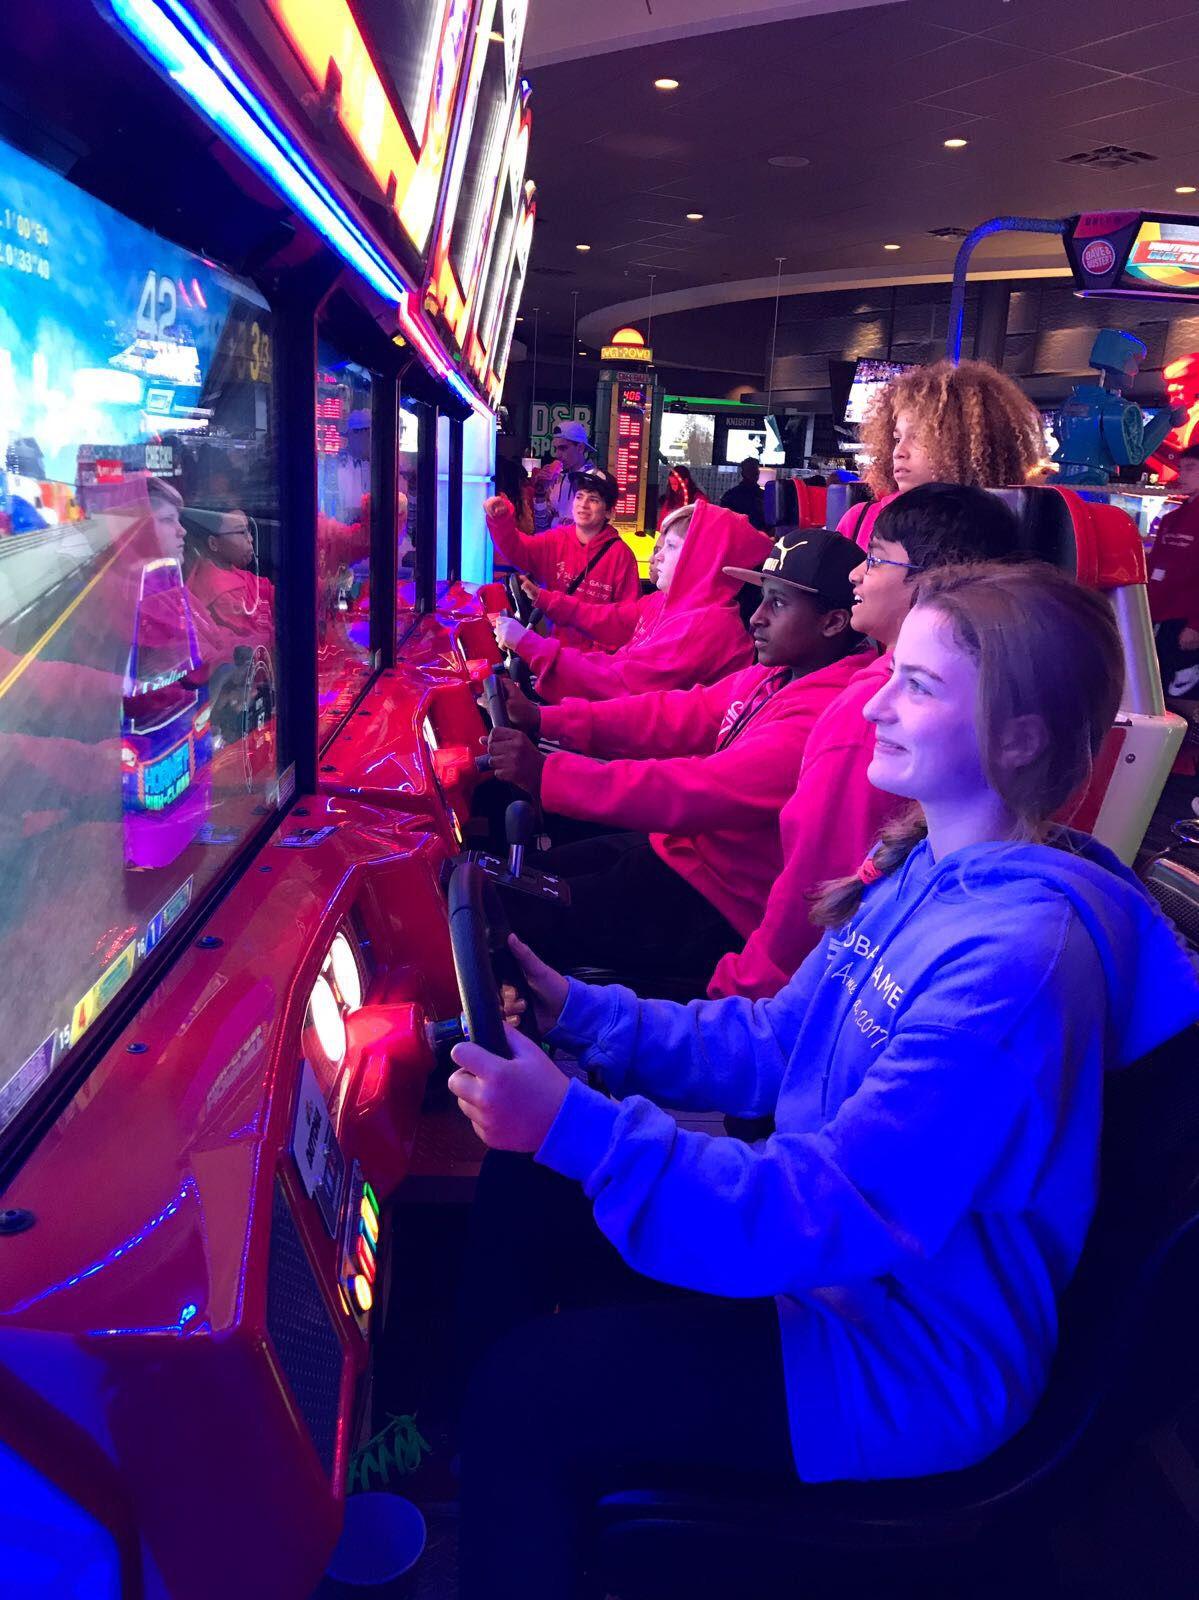 Naeglobalgames Globalgamesna More Fun And Games At Dave Buster S Dave Busters Dave And Buster S Sports Bar